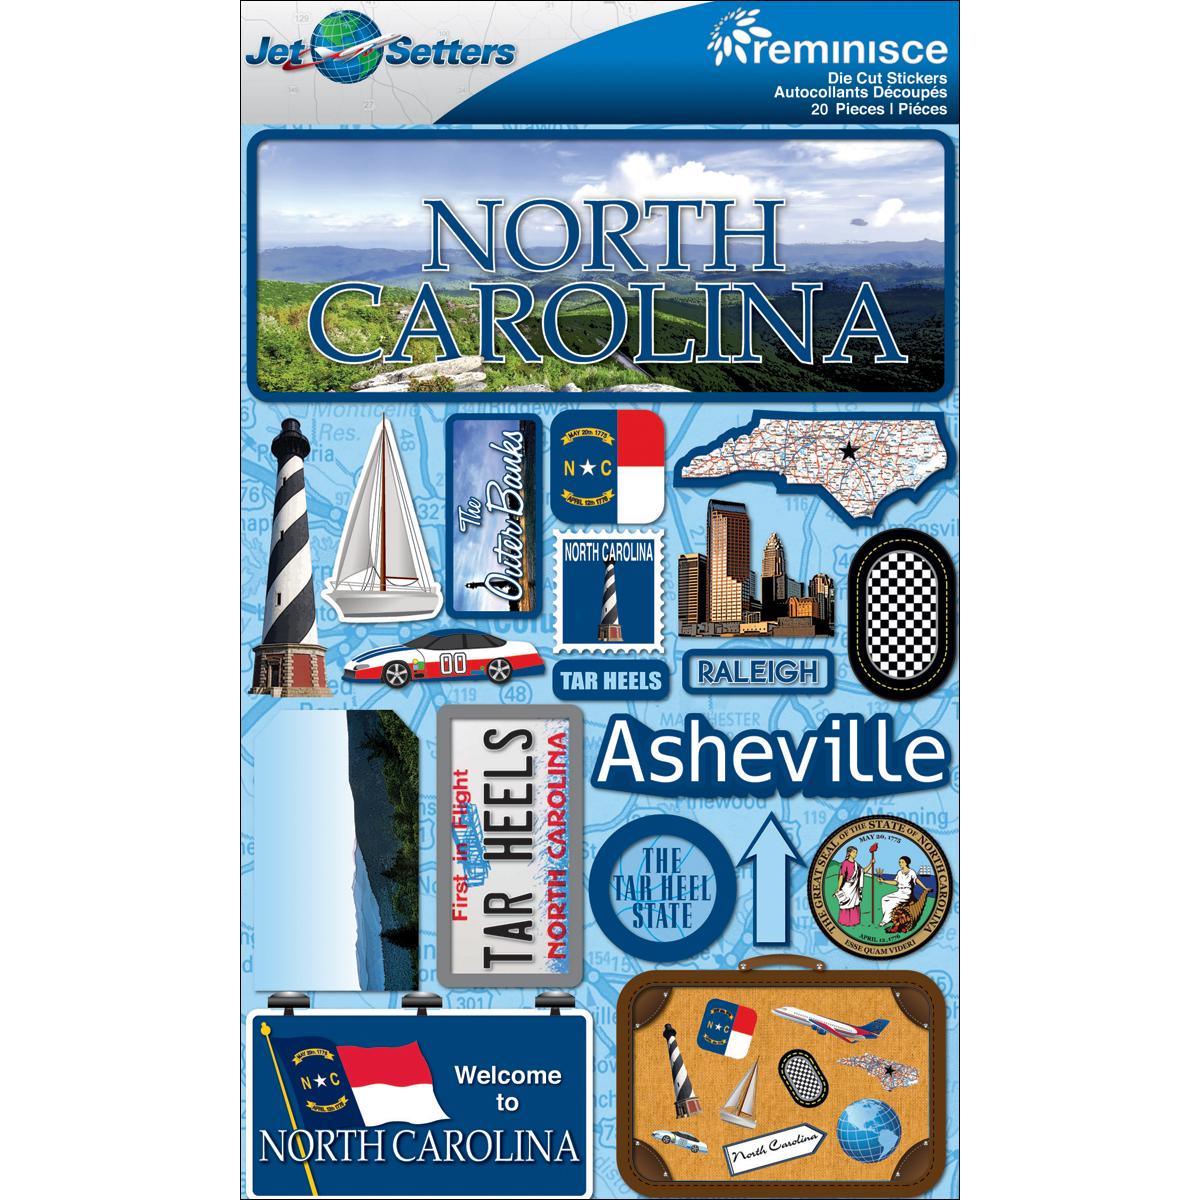 Reminisce Jet Setters State Dimensional Stickers 4.5X7.5-North Carolina